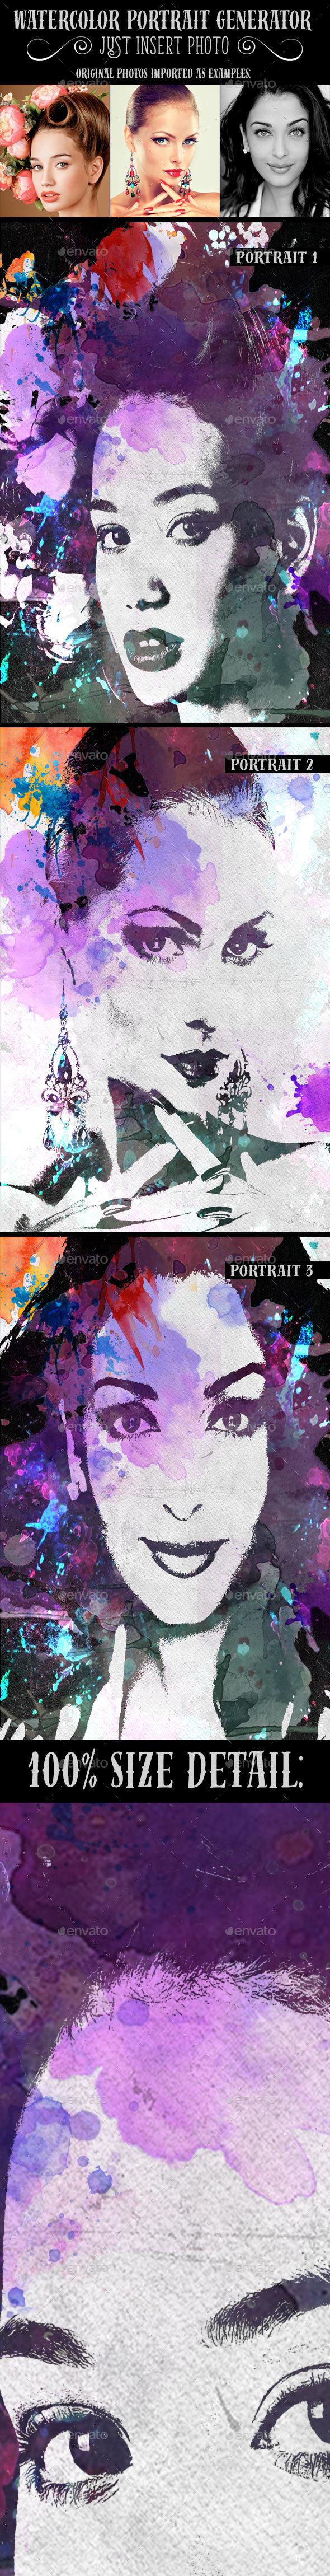 Watercolor Portrait Generator (Artistic)